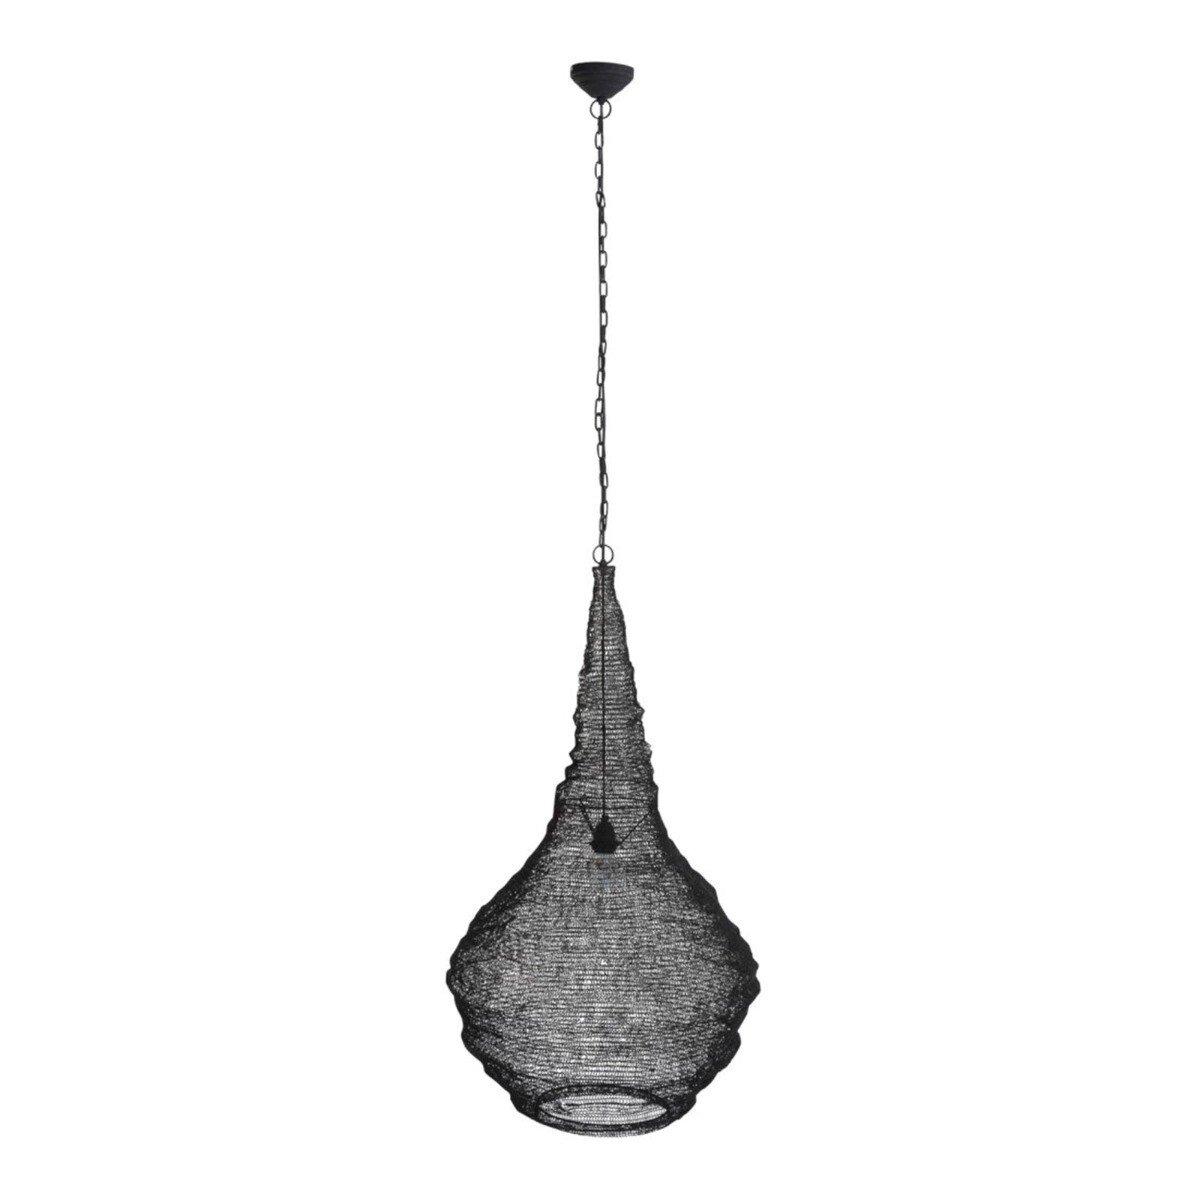 J-Line hanglamp costes gaas l 89 x �50